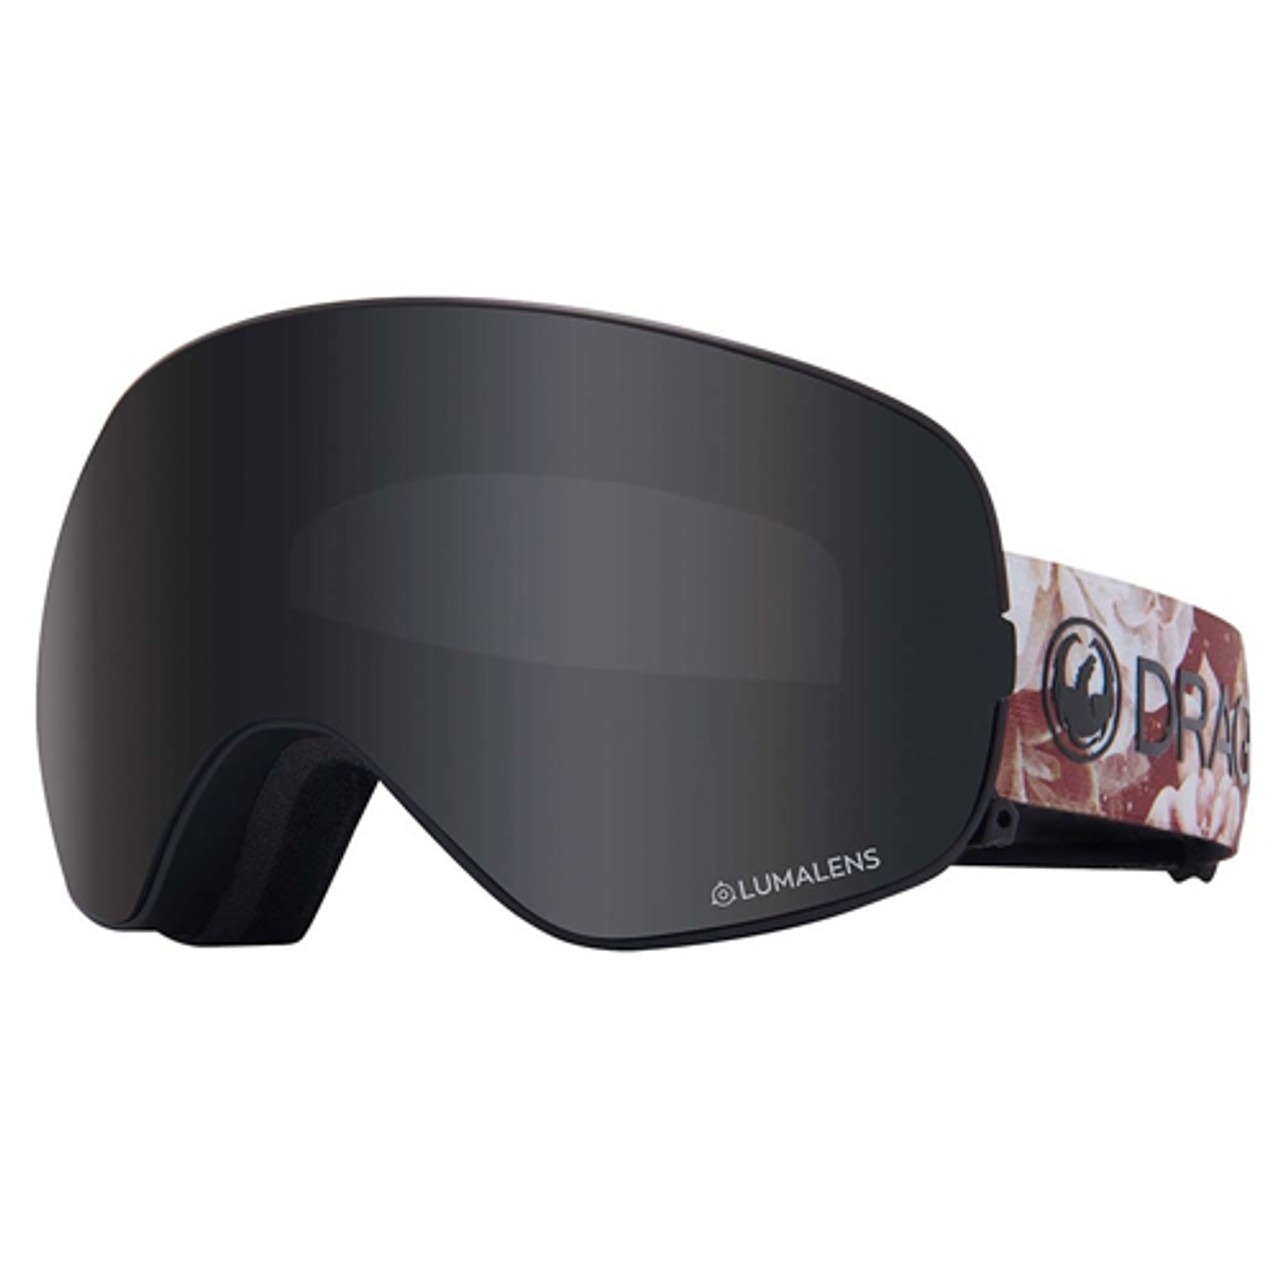 Lenses for Dragon X2S Ski Goggle